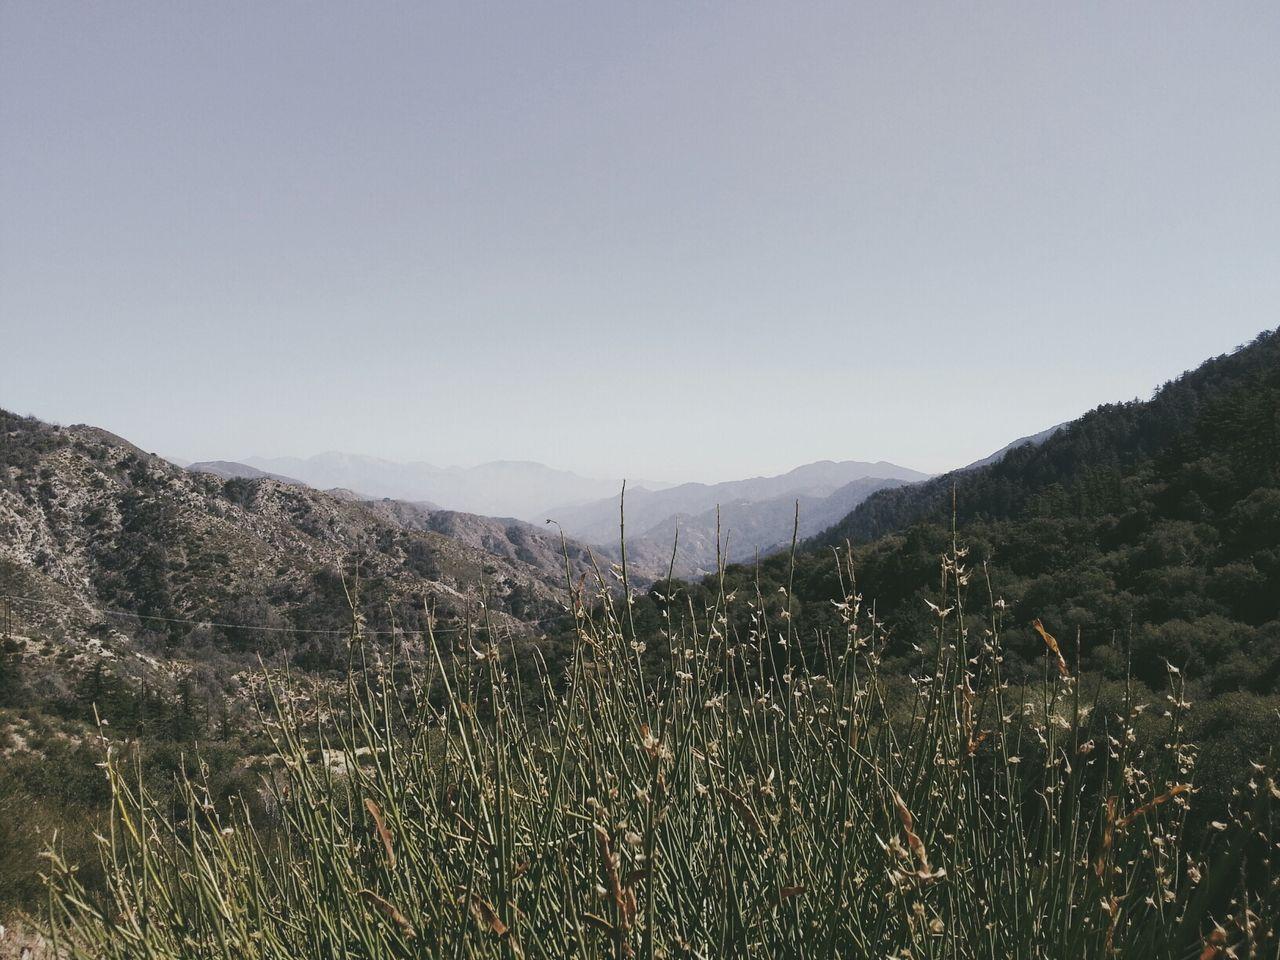 San Gabriel Mountains Vscocam Fltrlive Shootermag